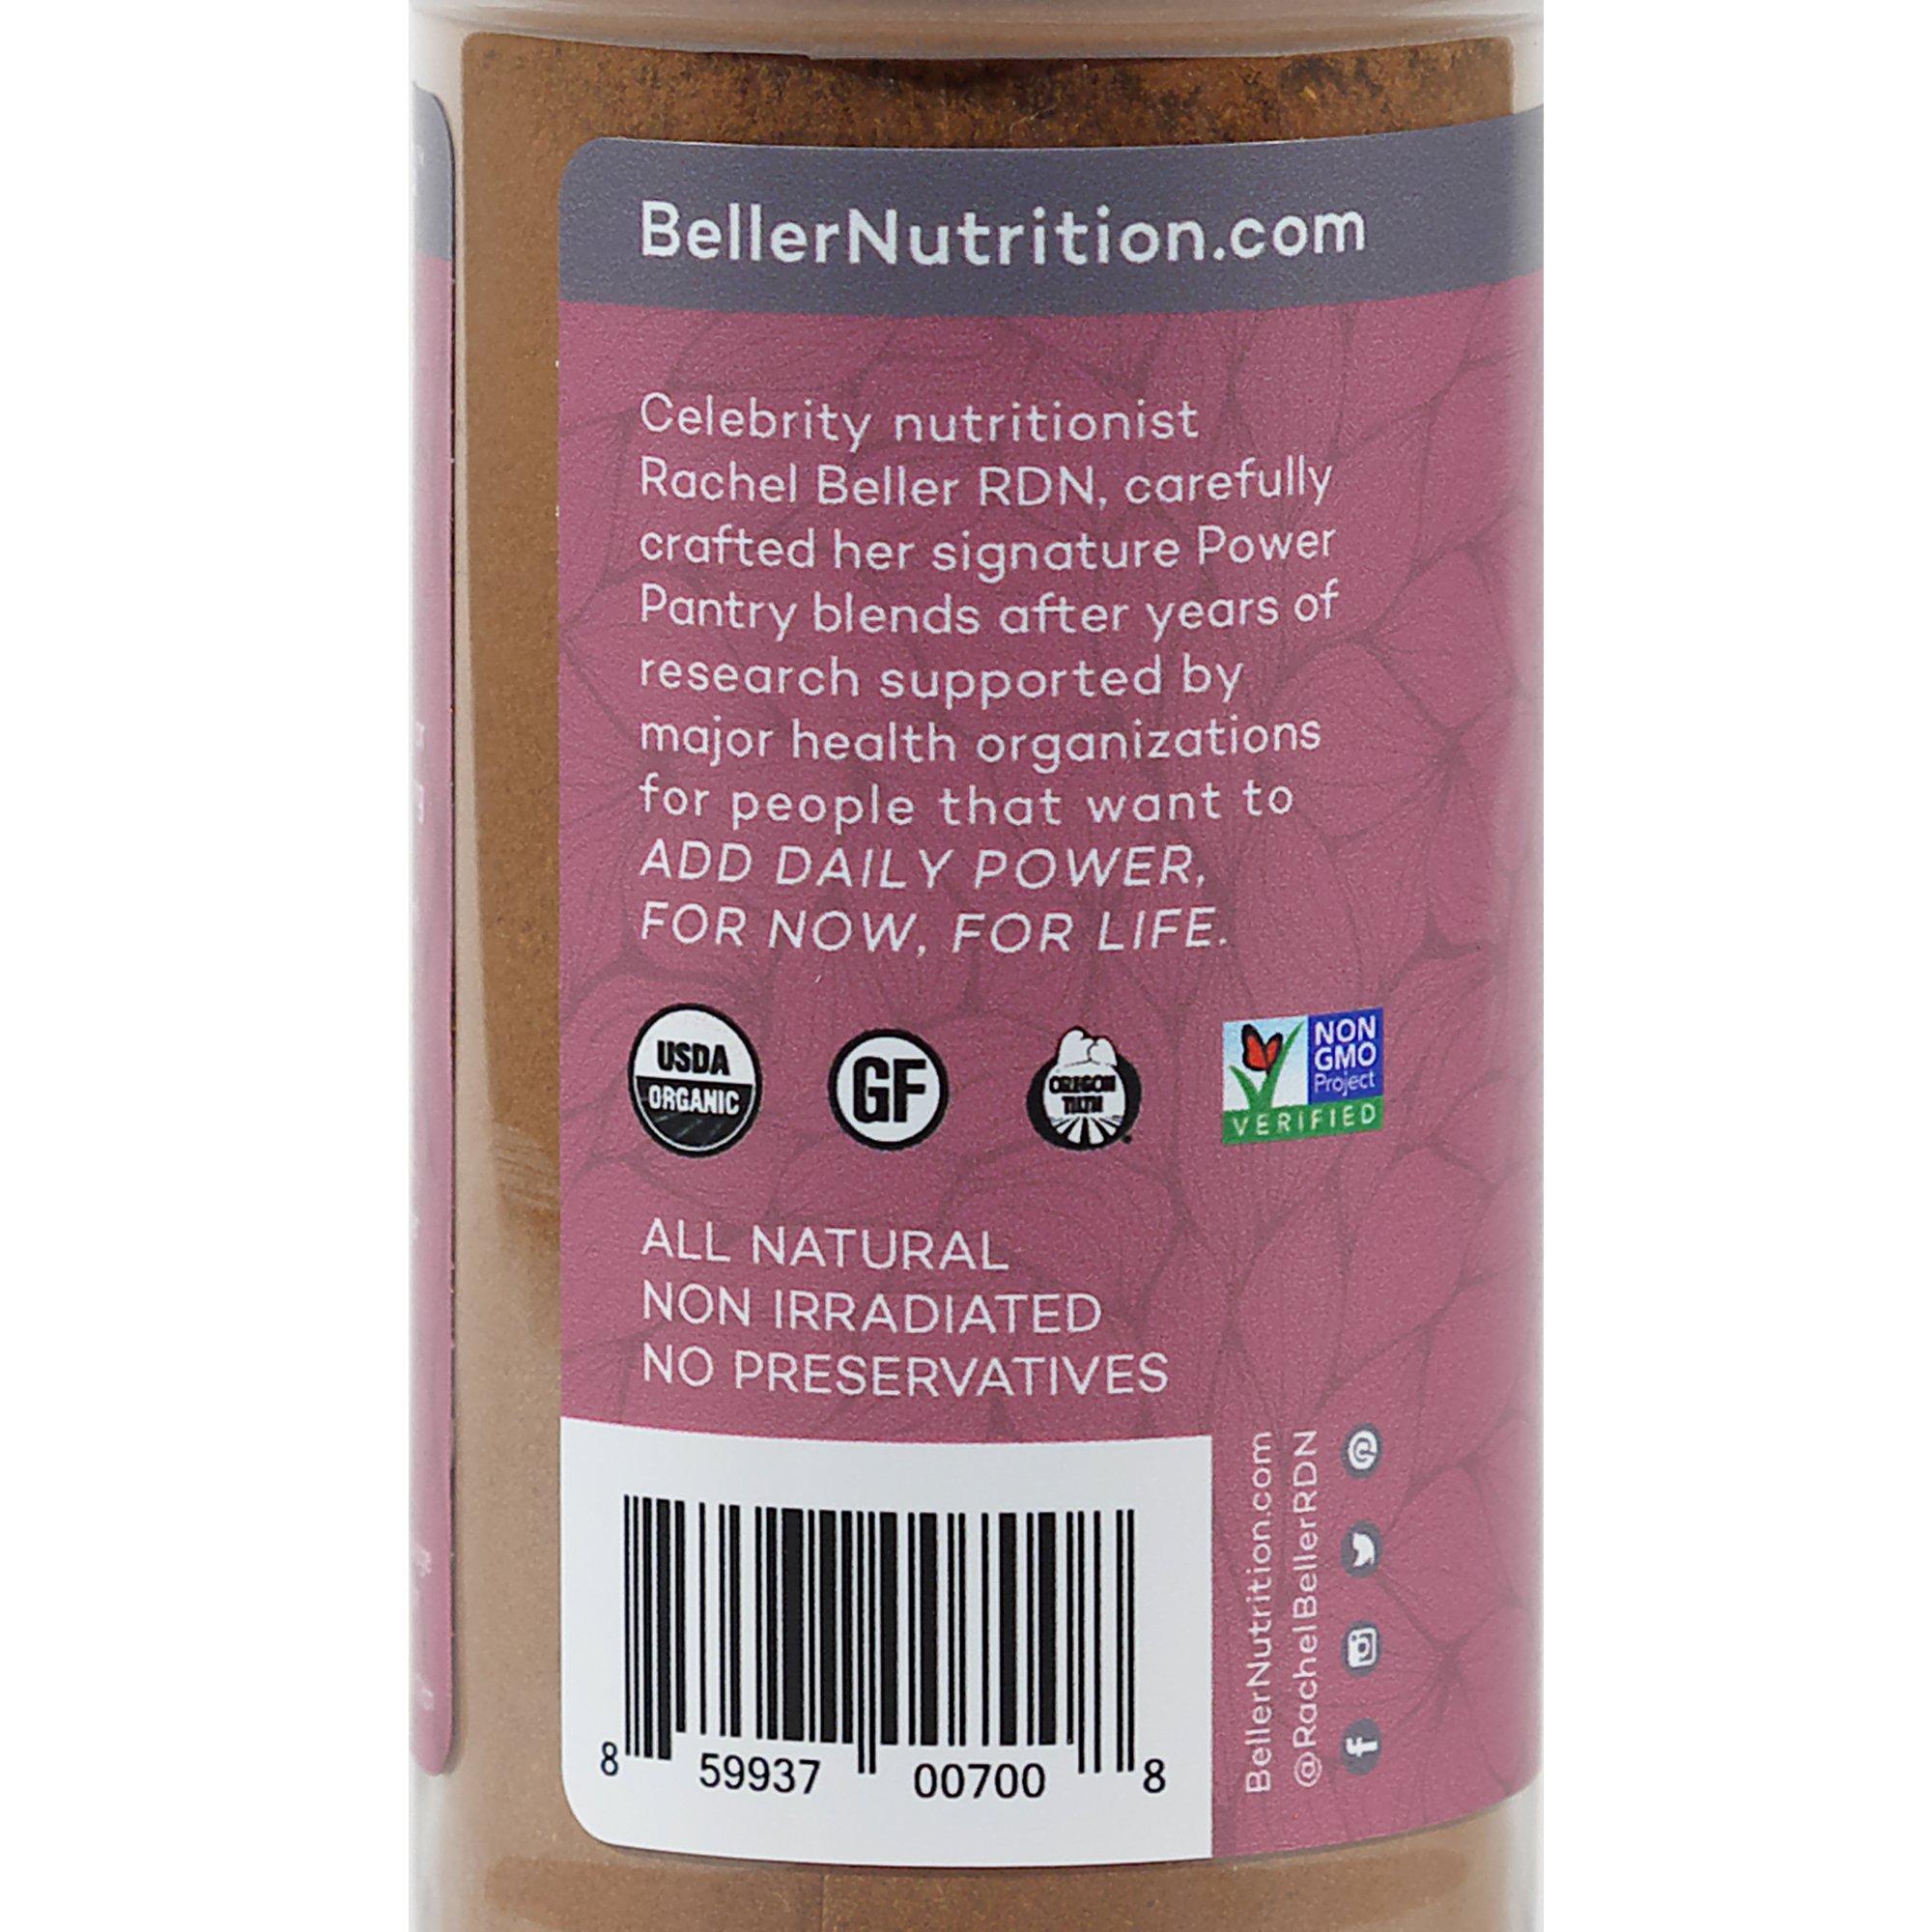 Rachel Beller's Power Pantry CinnaPeel Spicer - All organic Ceylon cinnamon, orange peel, and ginger spice blend, 3.4 ounce by Rachel Beller's Power Pantry (Image #4)